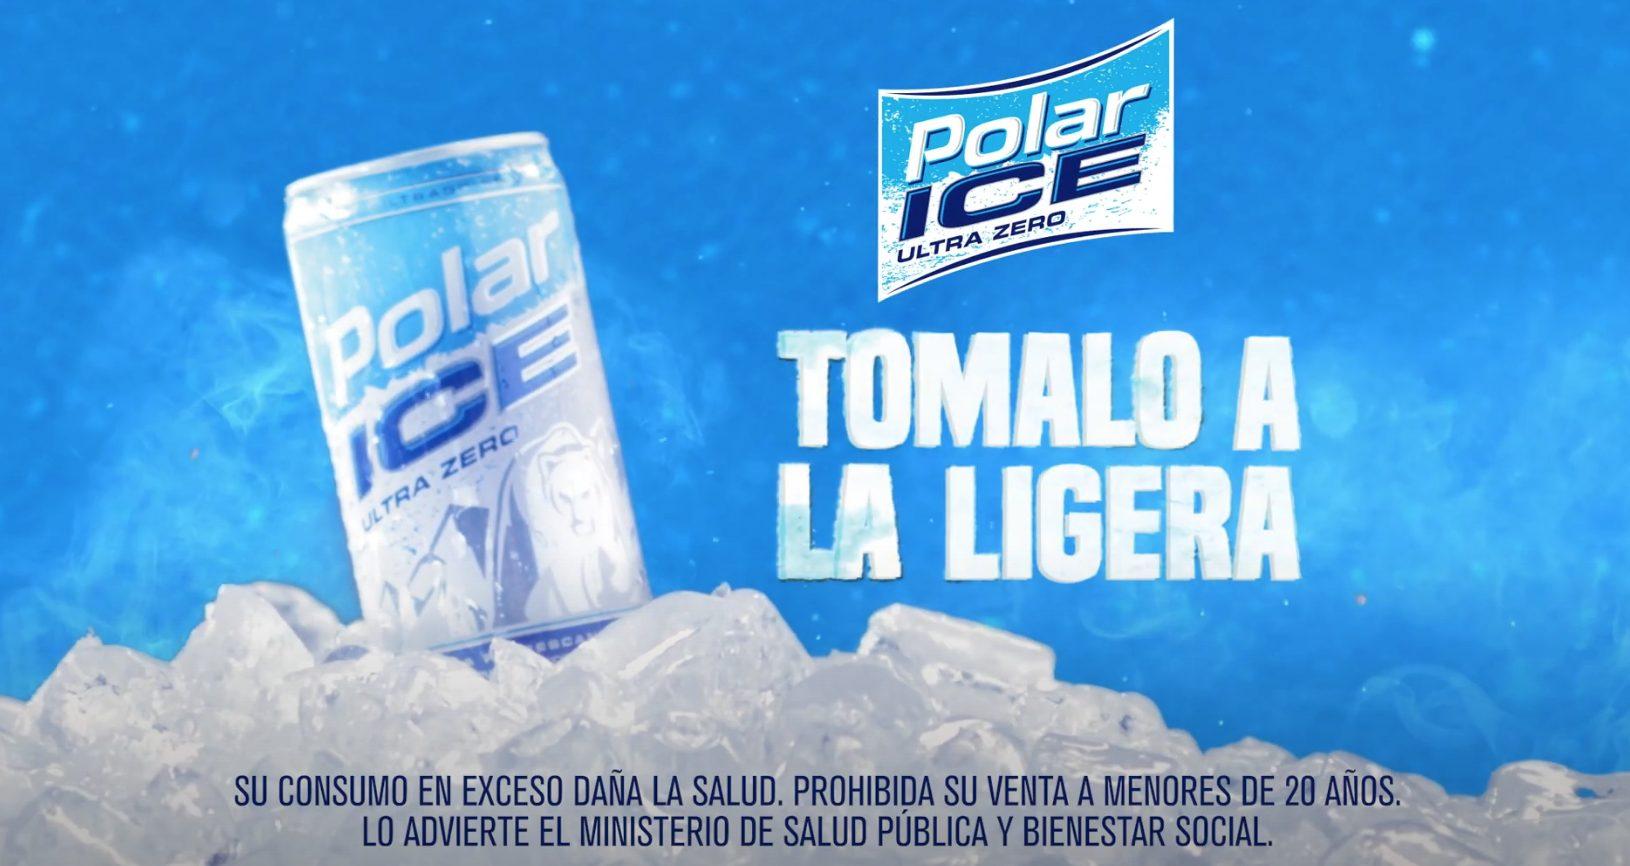 POLAR ICE ULTRA ZERO